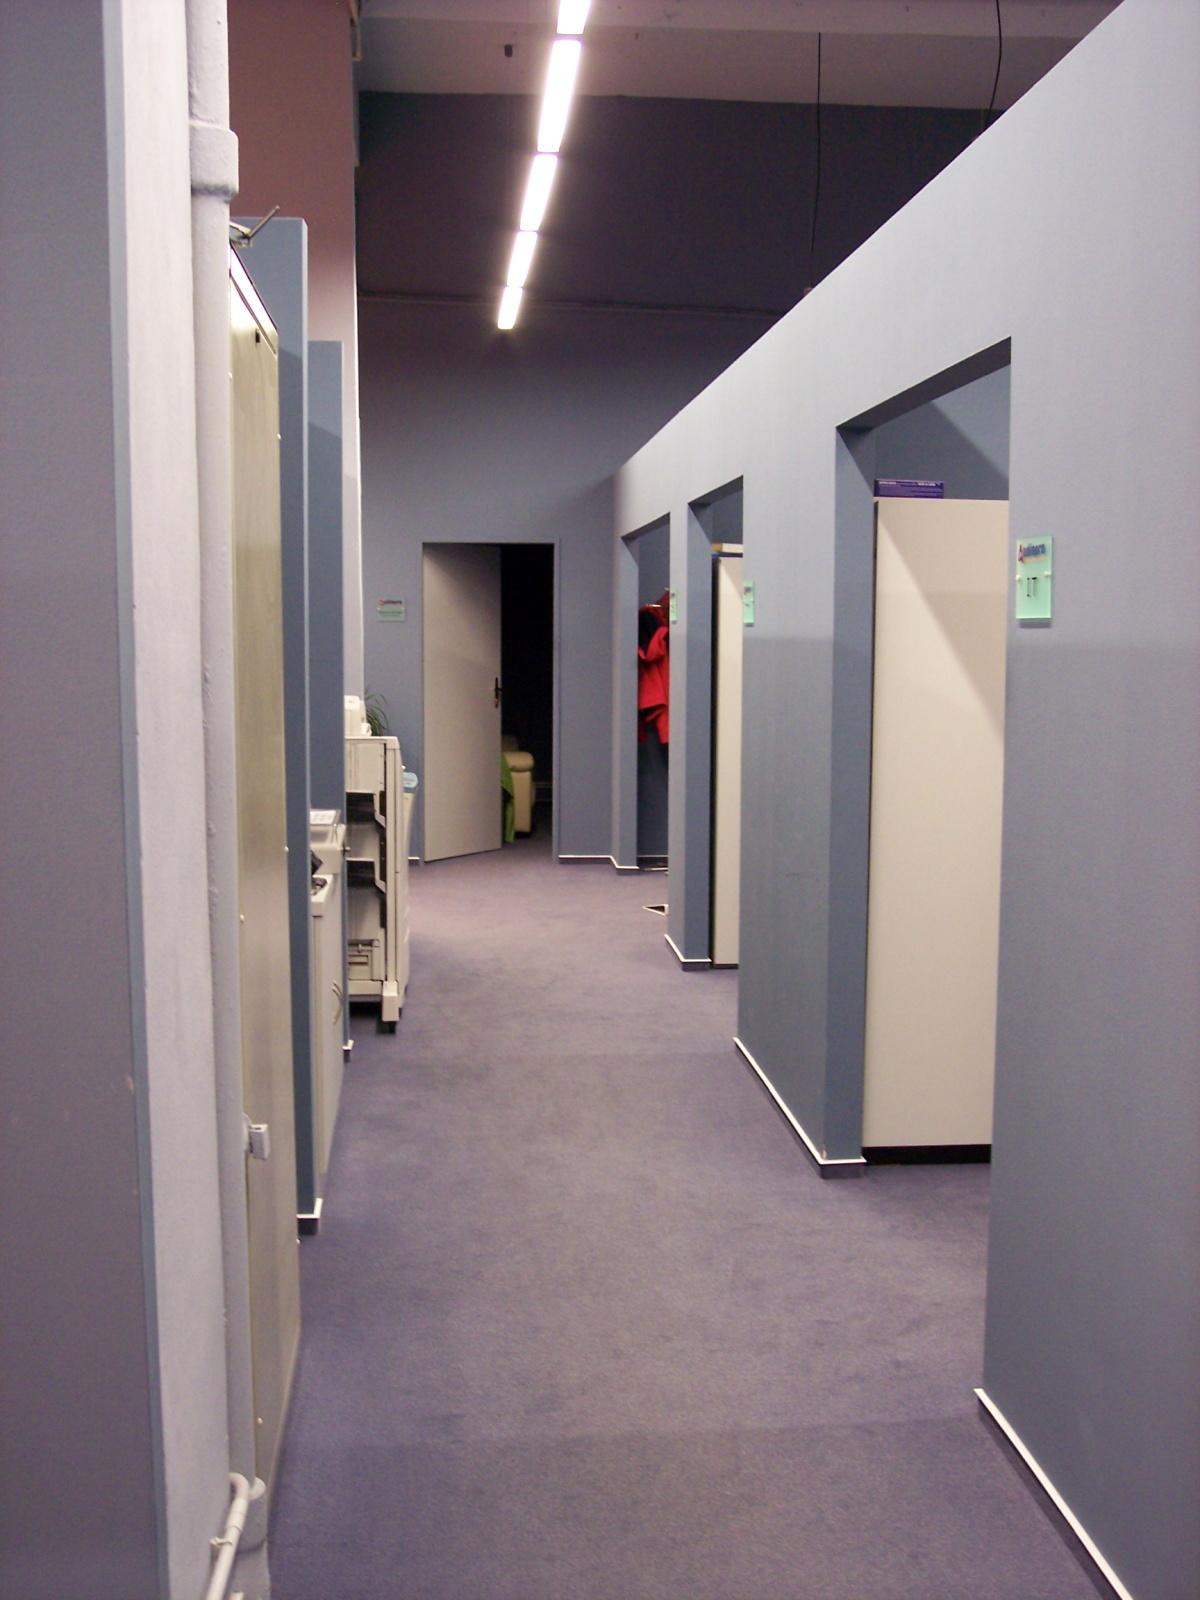 Sídlo firmy, audiotechnika - Business centrum Praha 6